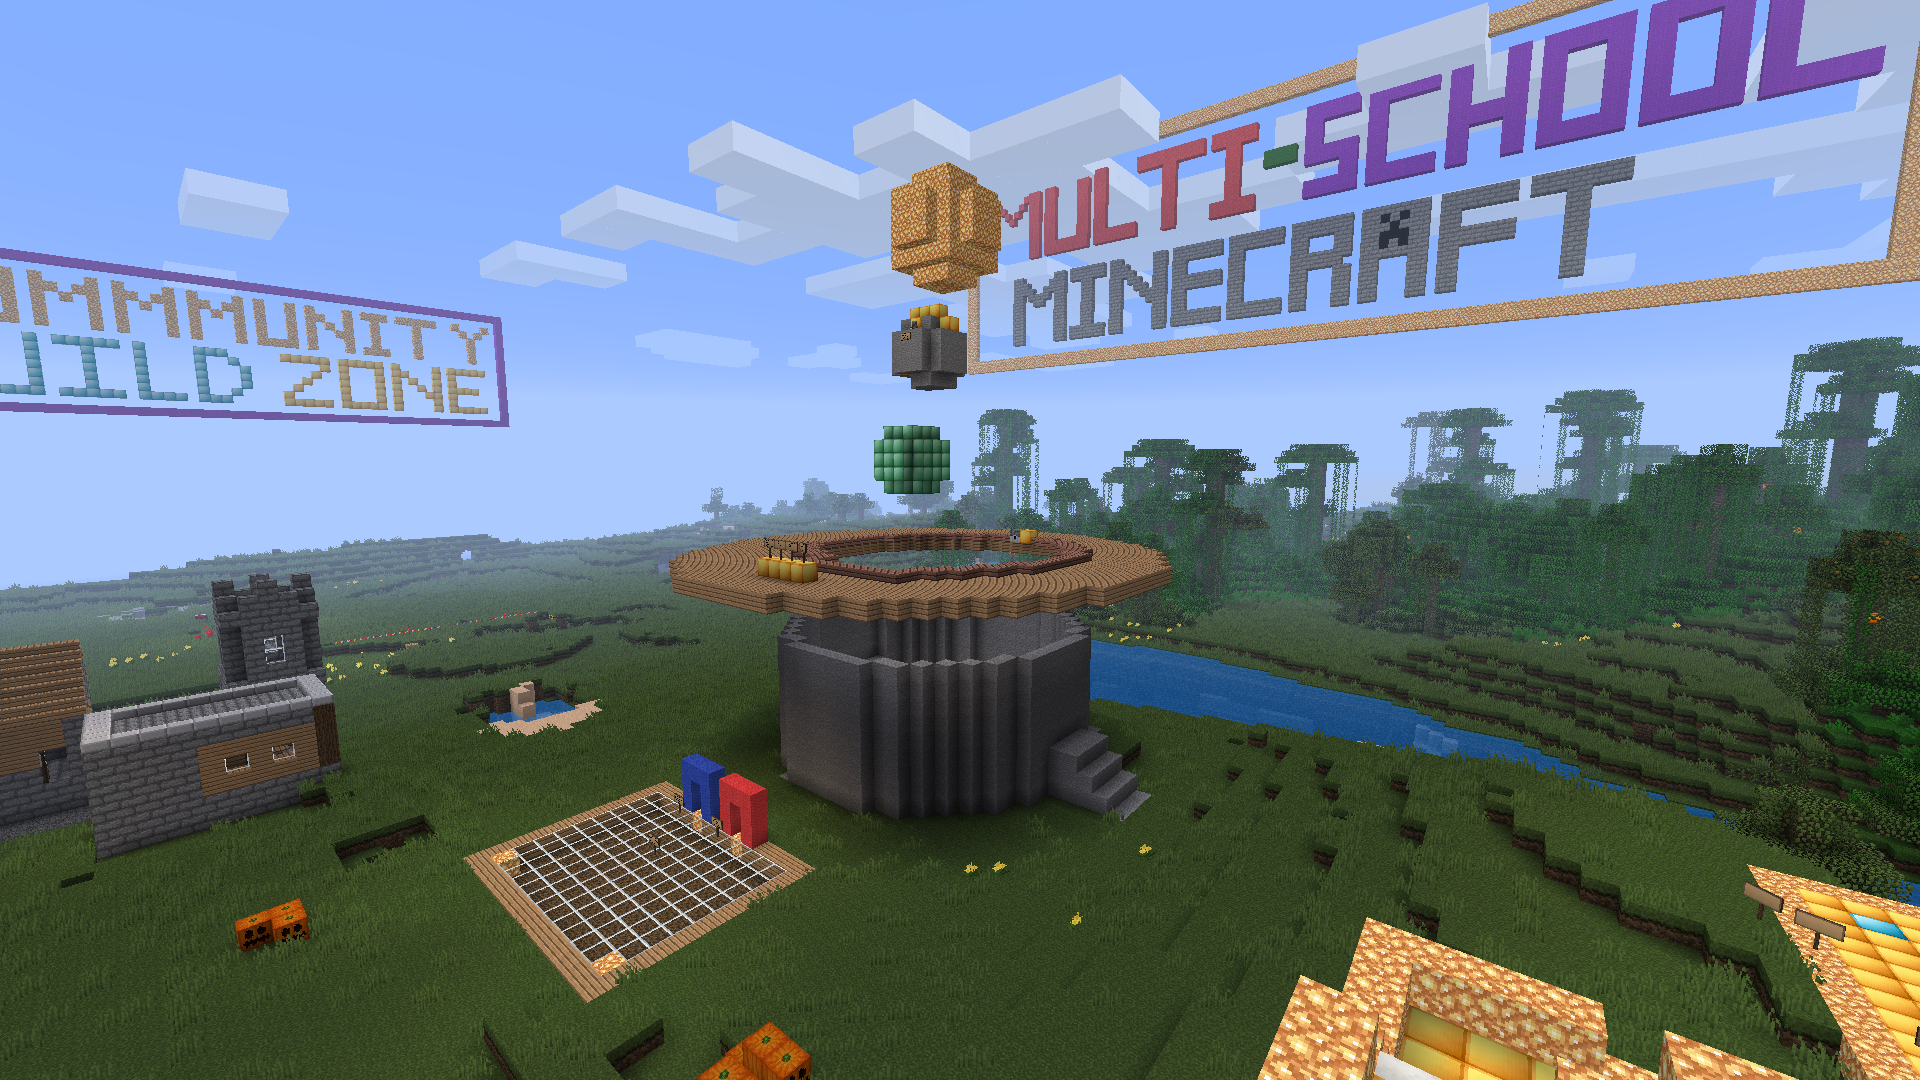 school minecraft server